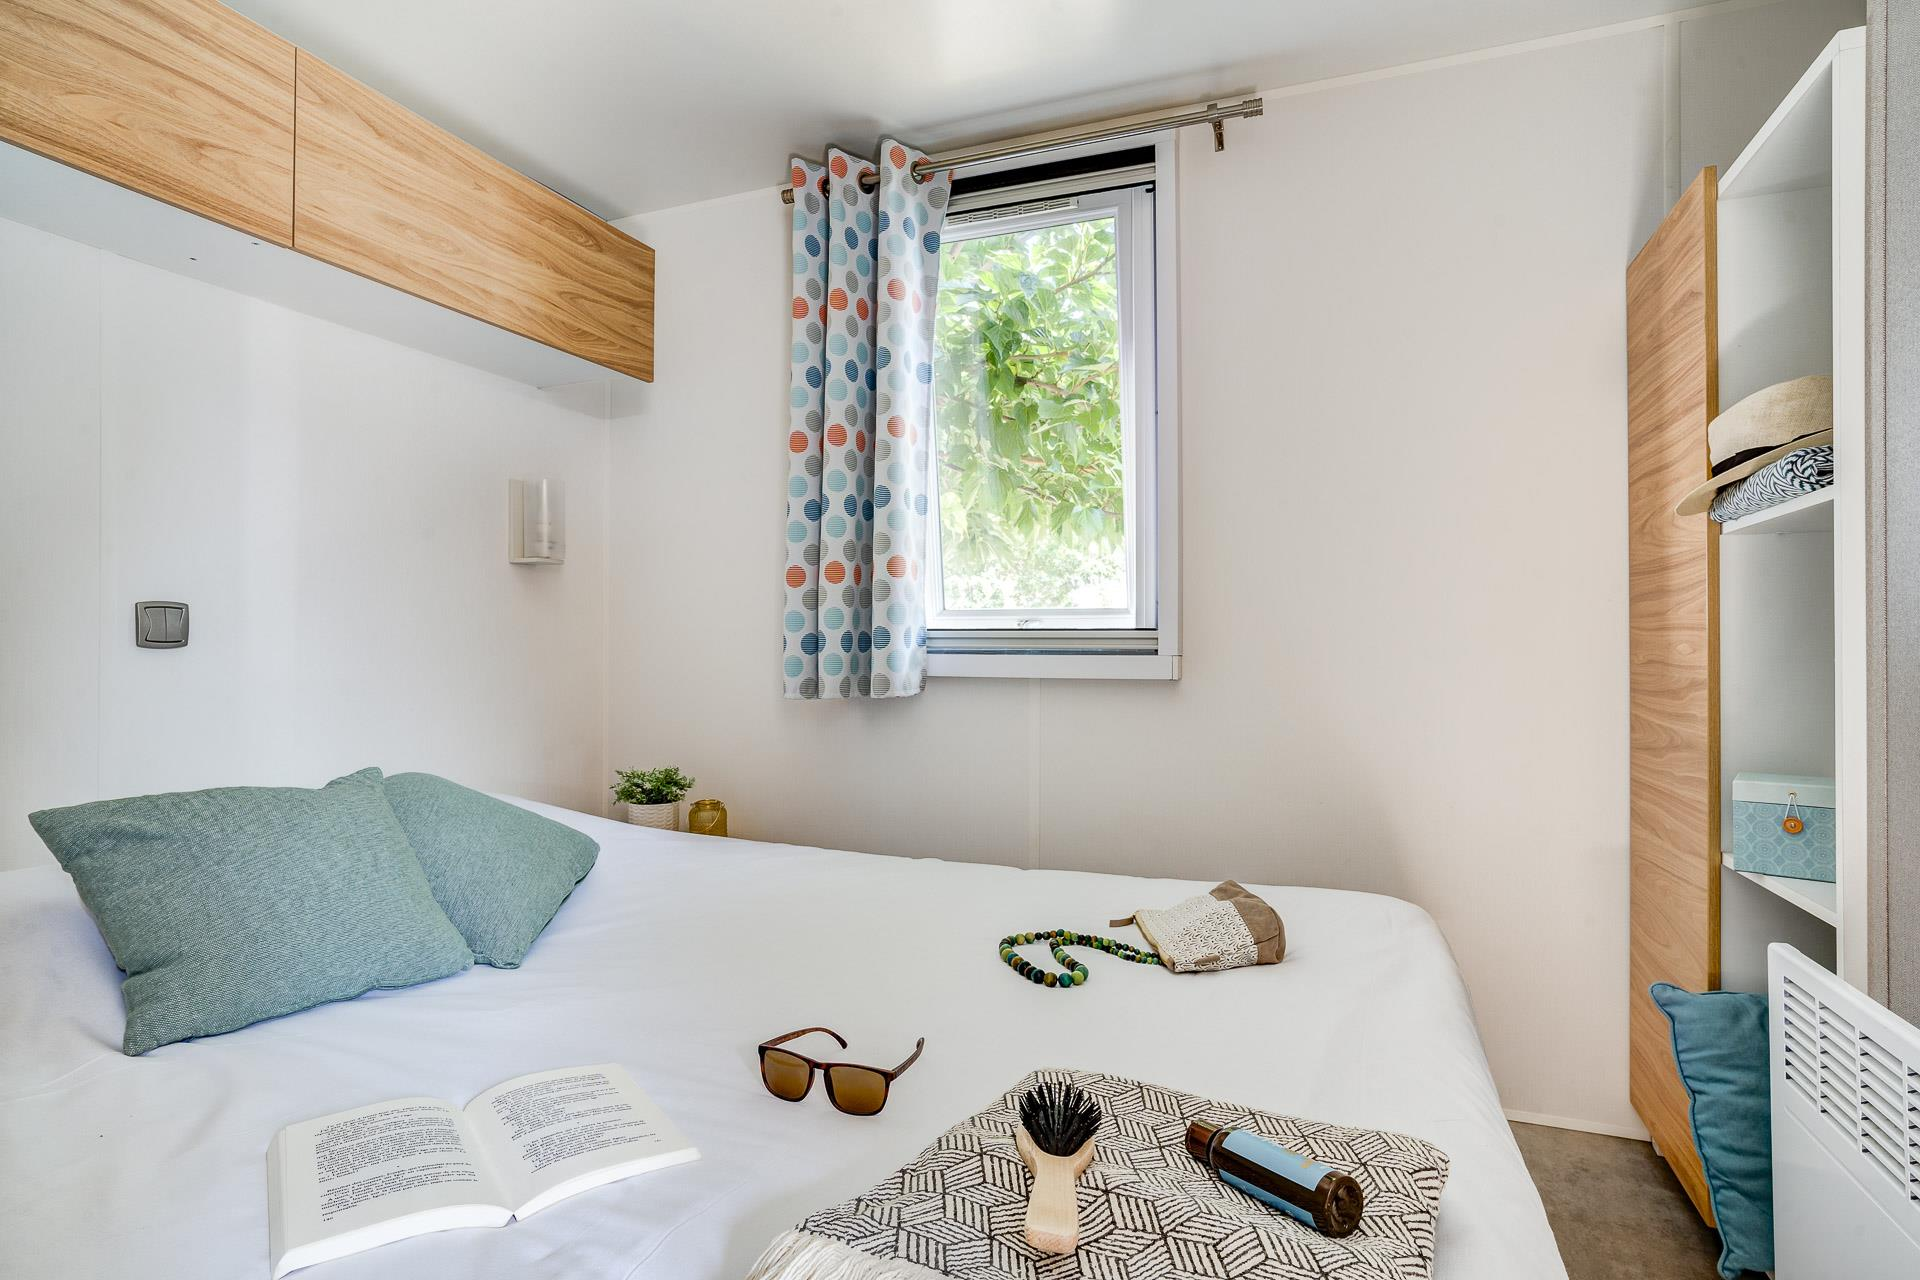 Location - Cottage Surf 2 Chambres Climatisé Premium - Camping Sandaya Soulac Plage